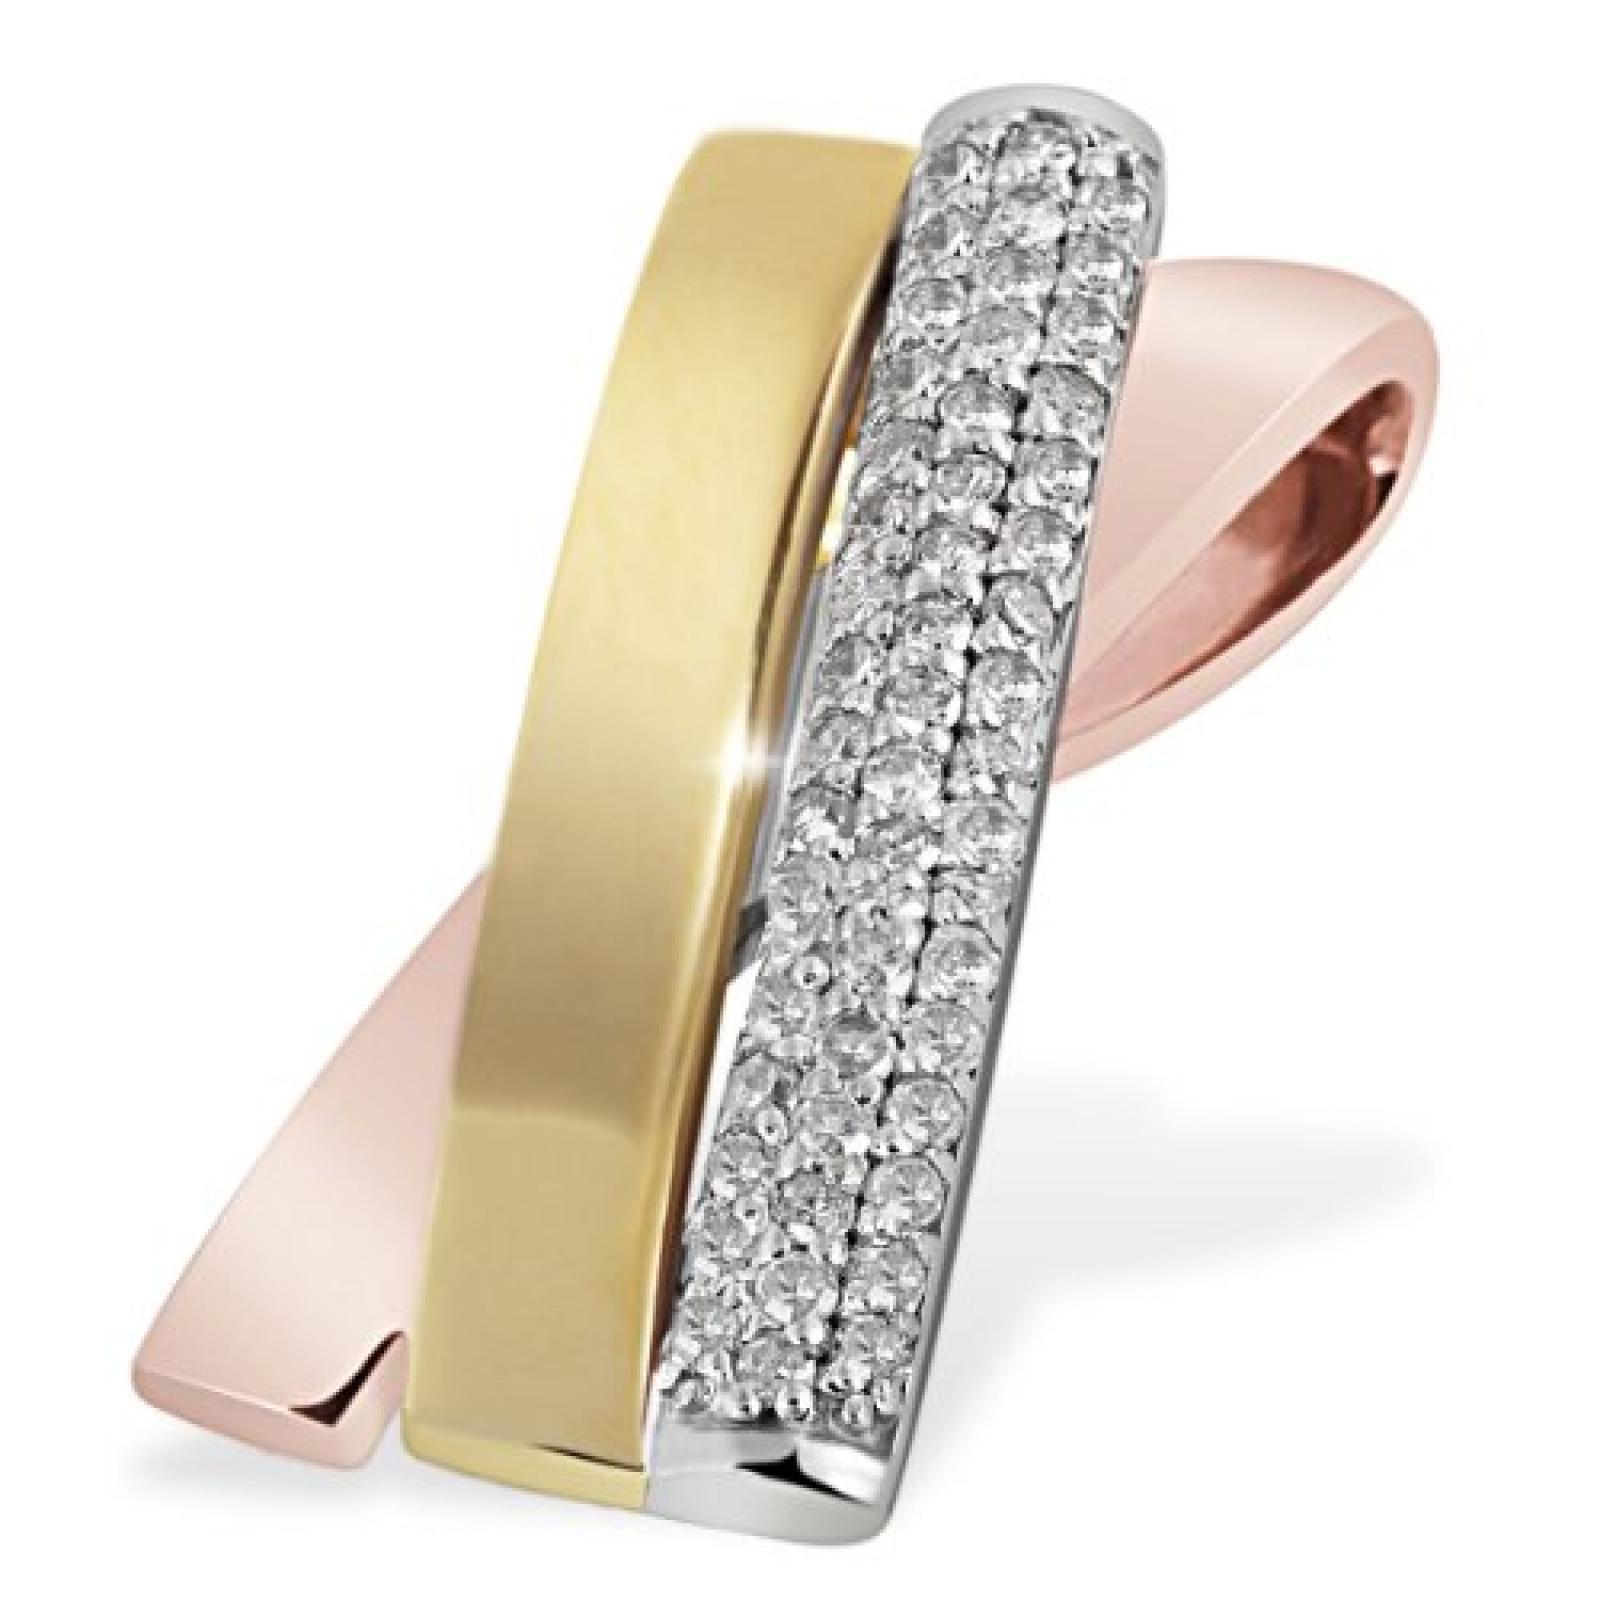 Goldmaid Damen-Anhänger Pavee Tricolor 375 Gold 51 Diamanten 0,27 ct. Pa A4933TR